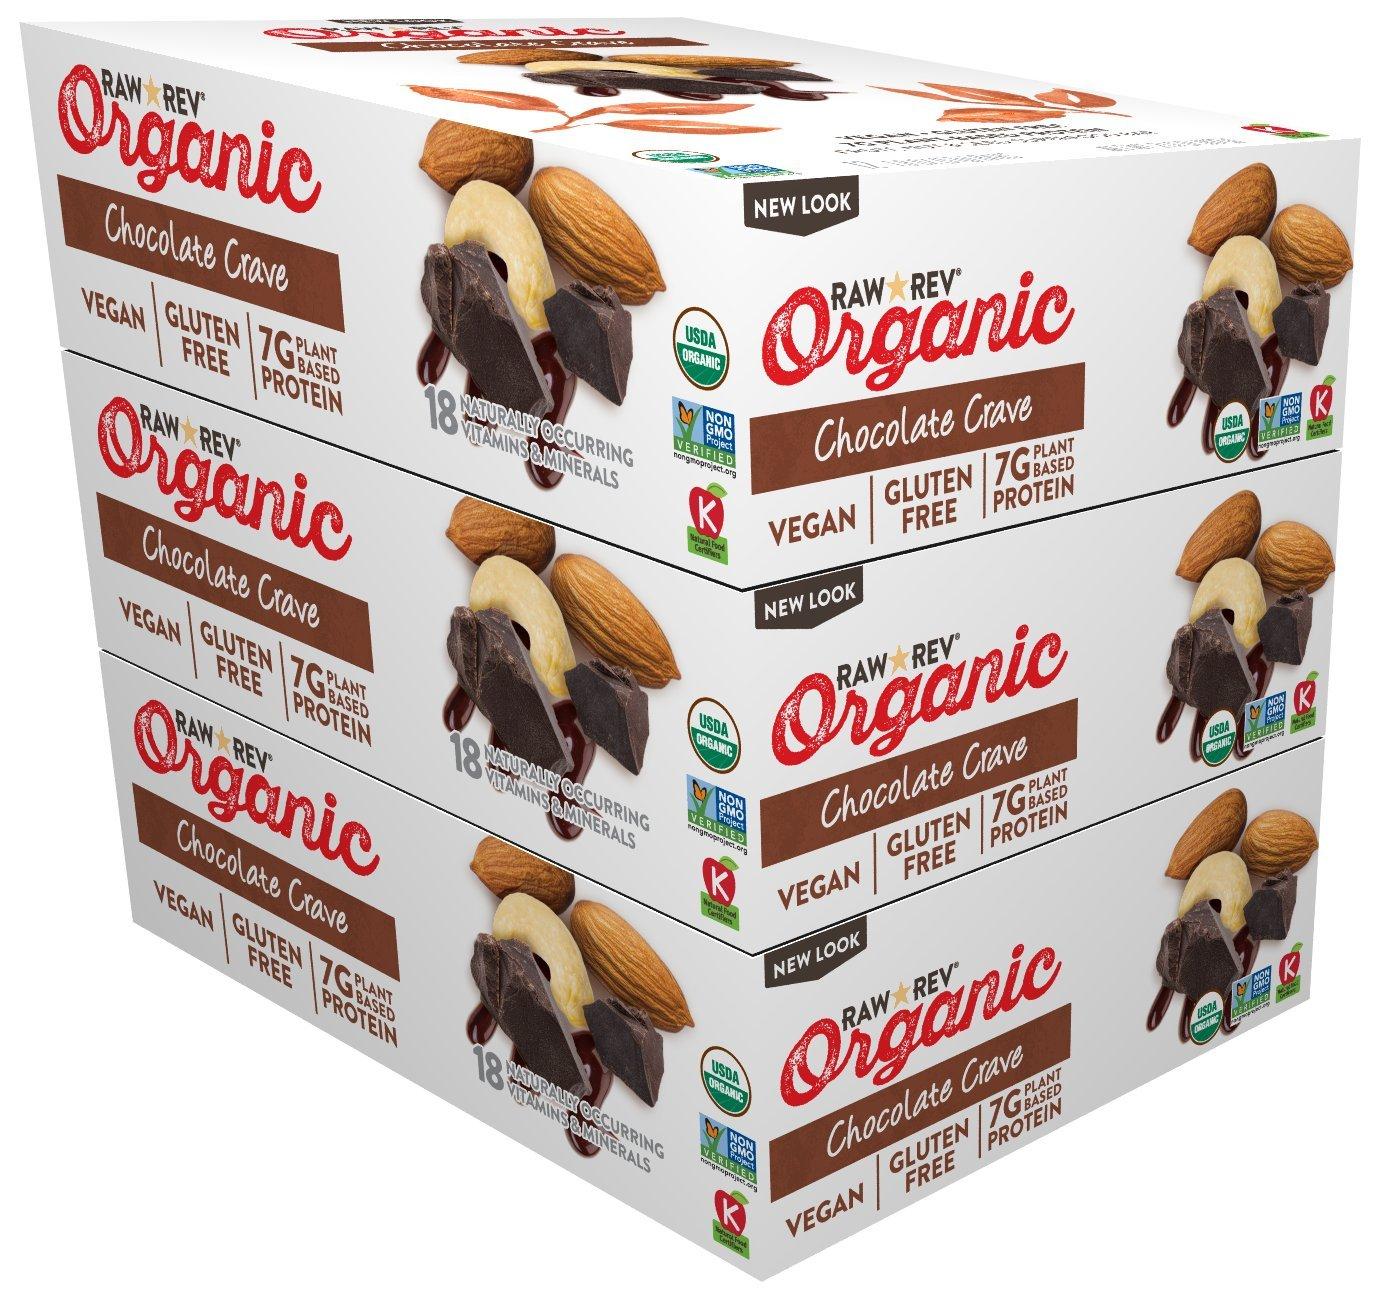 Raw Rev Organic Vegan, Gluten-Free Fruit, Nut, Seed Bars - Chocolate Crave 1.8 ounce (Pack of 36)